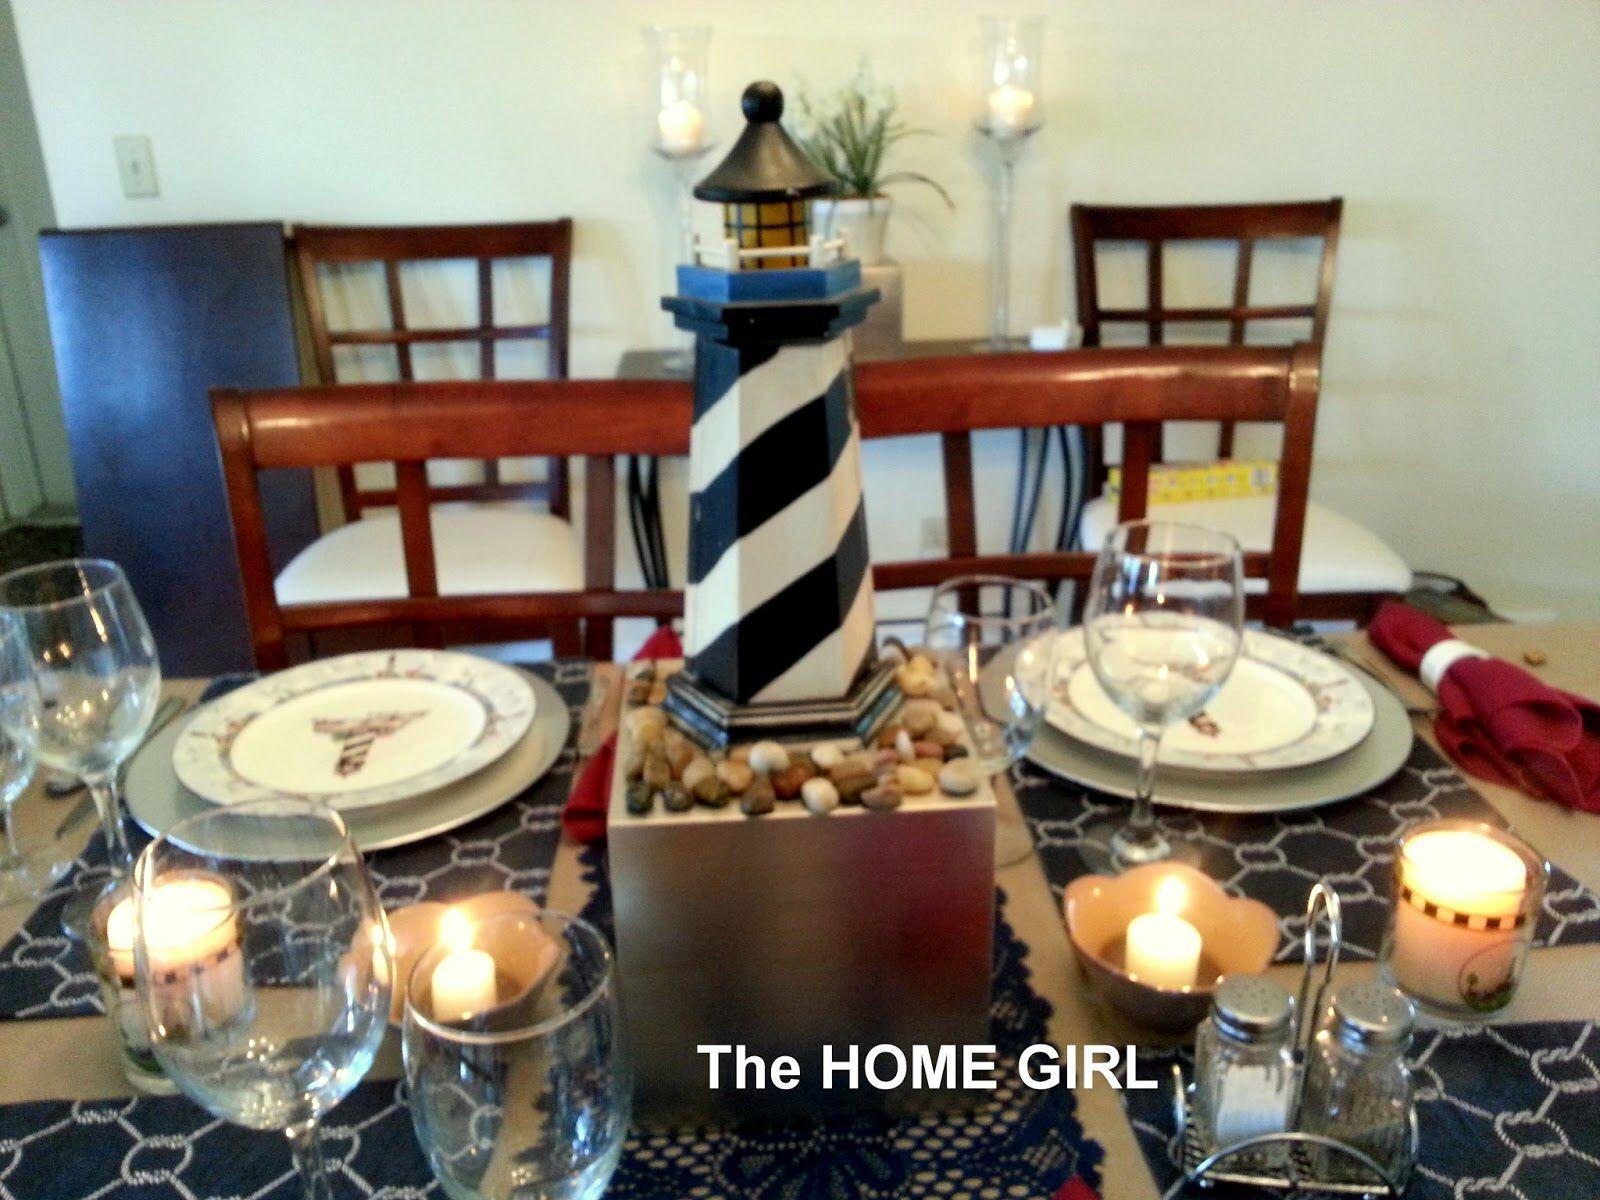 Lighthouse Centerpiece Idea Nautical Theme Tea Party Table Tablescapes Table Centerpieces